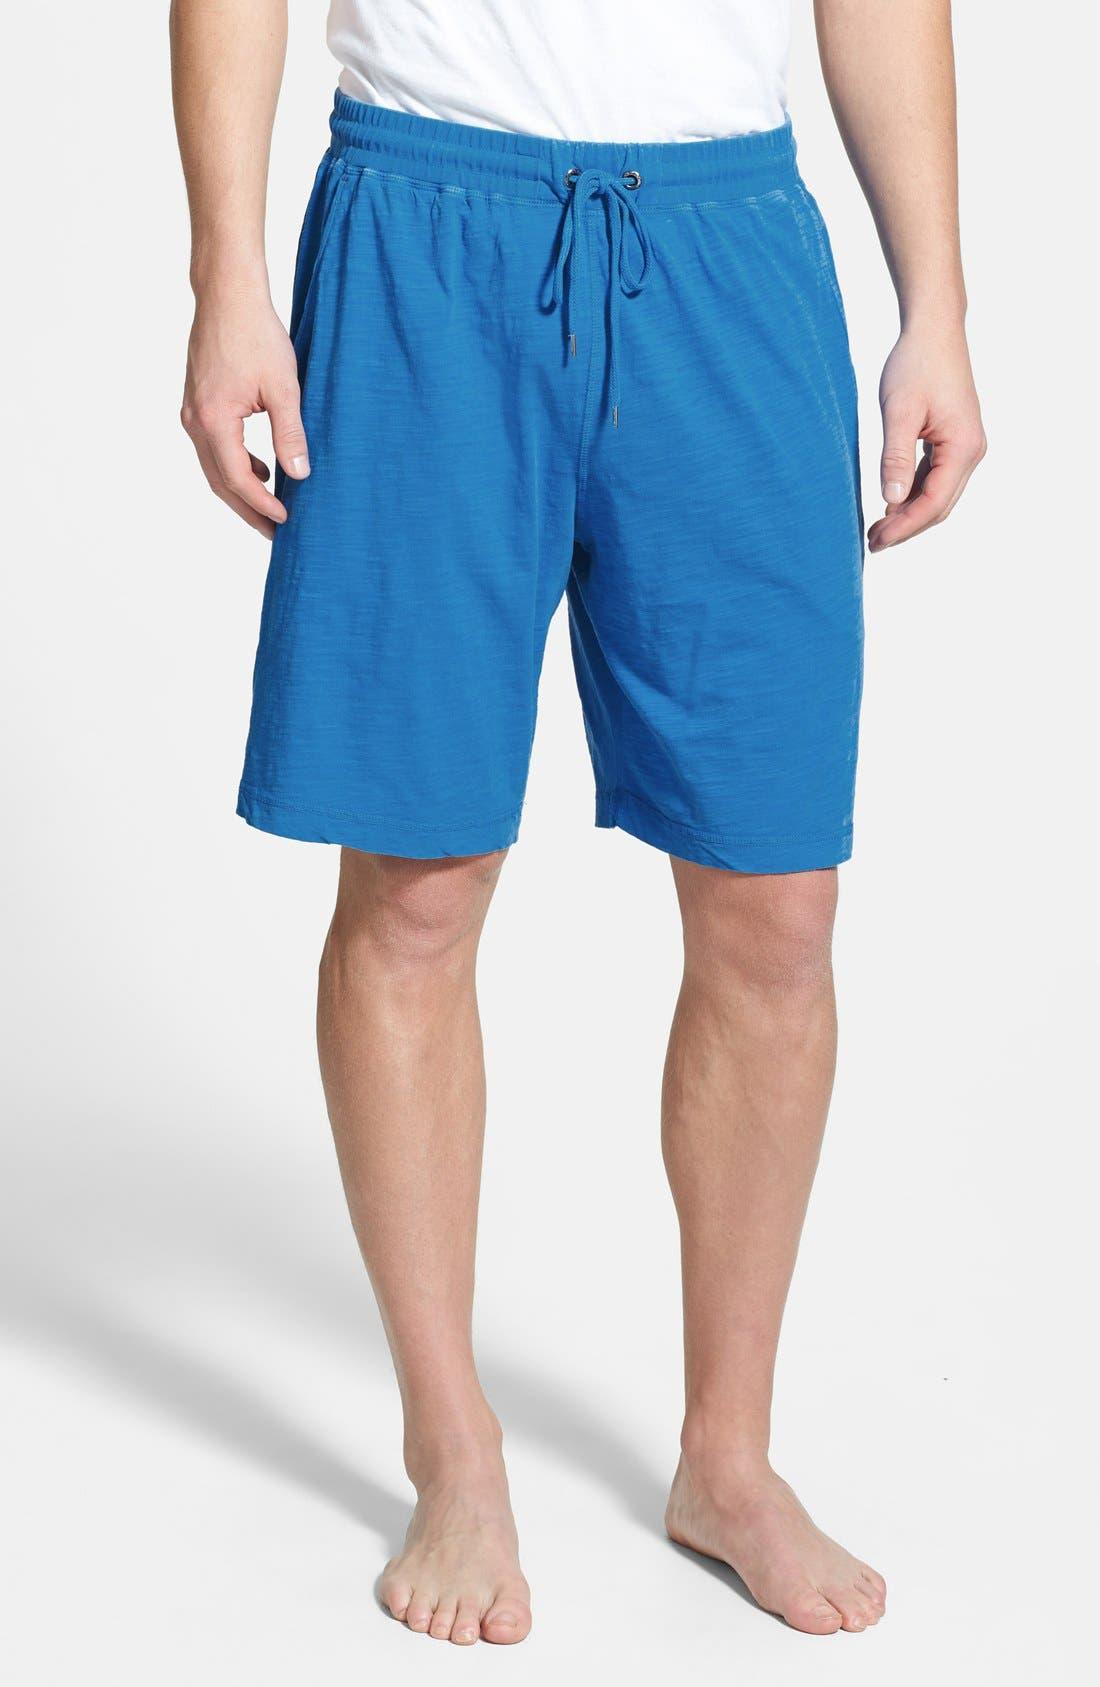 Alternate Image 1 Selected - Daniel Buchler Cotton Slub Lounge Shorts